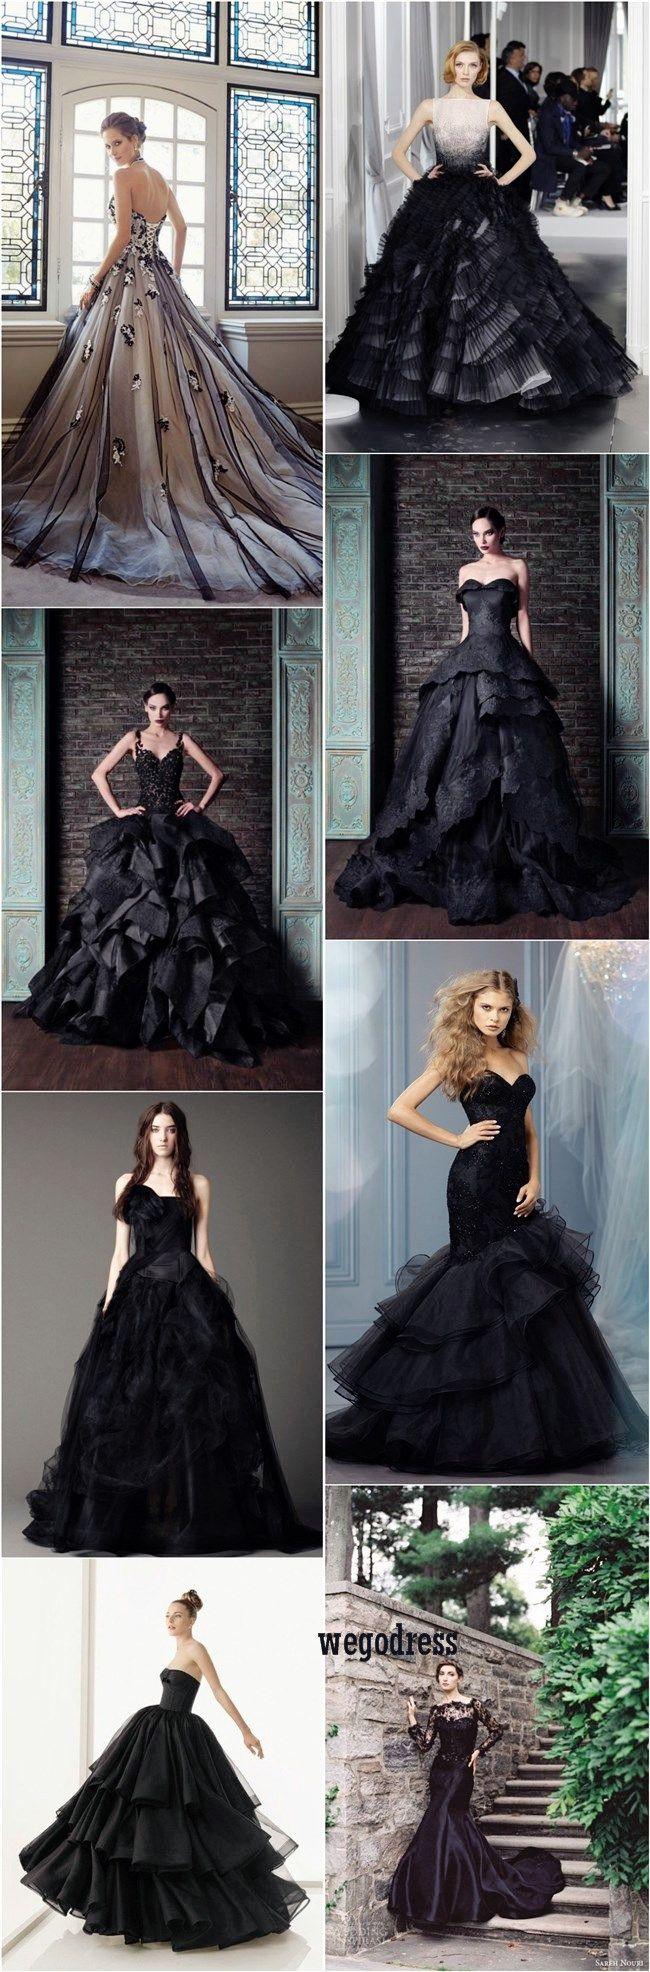 Vintage black wedding dresses   Gorgeous Black Wedding Dresses  Black wedding dresses Wedding